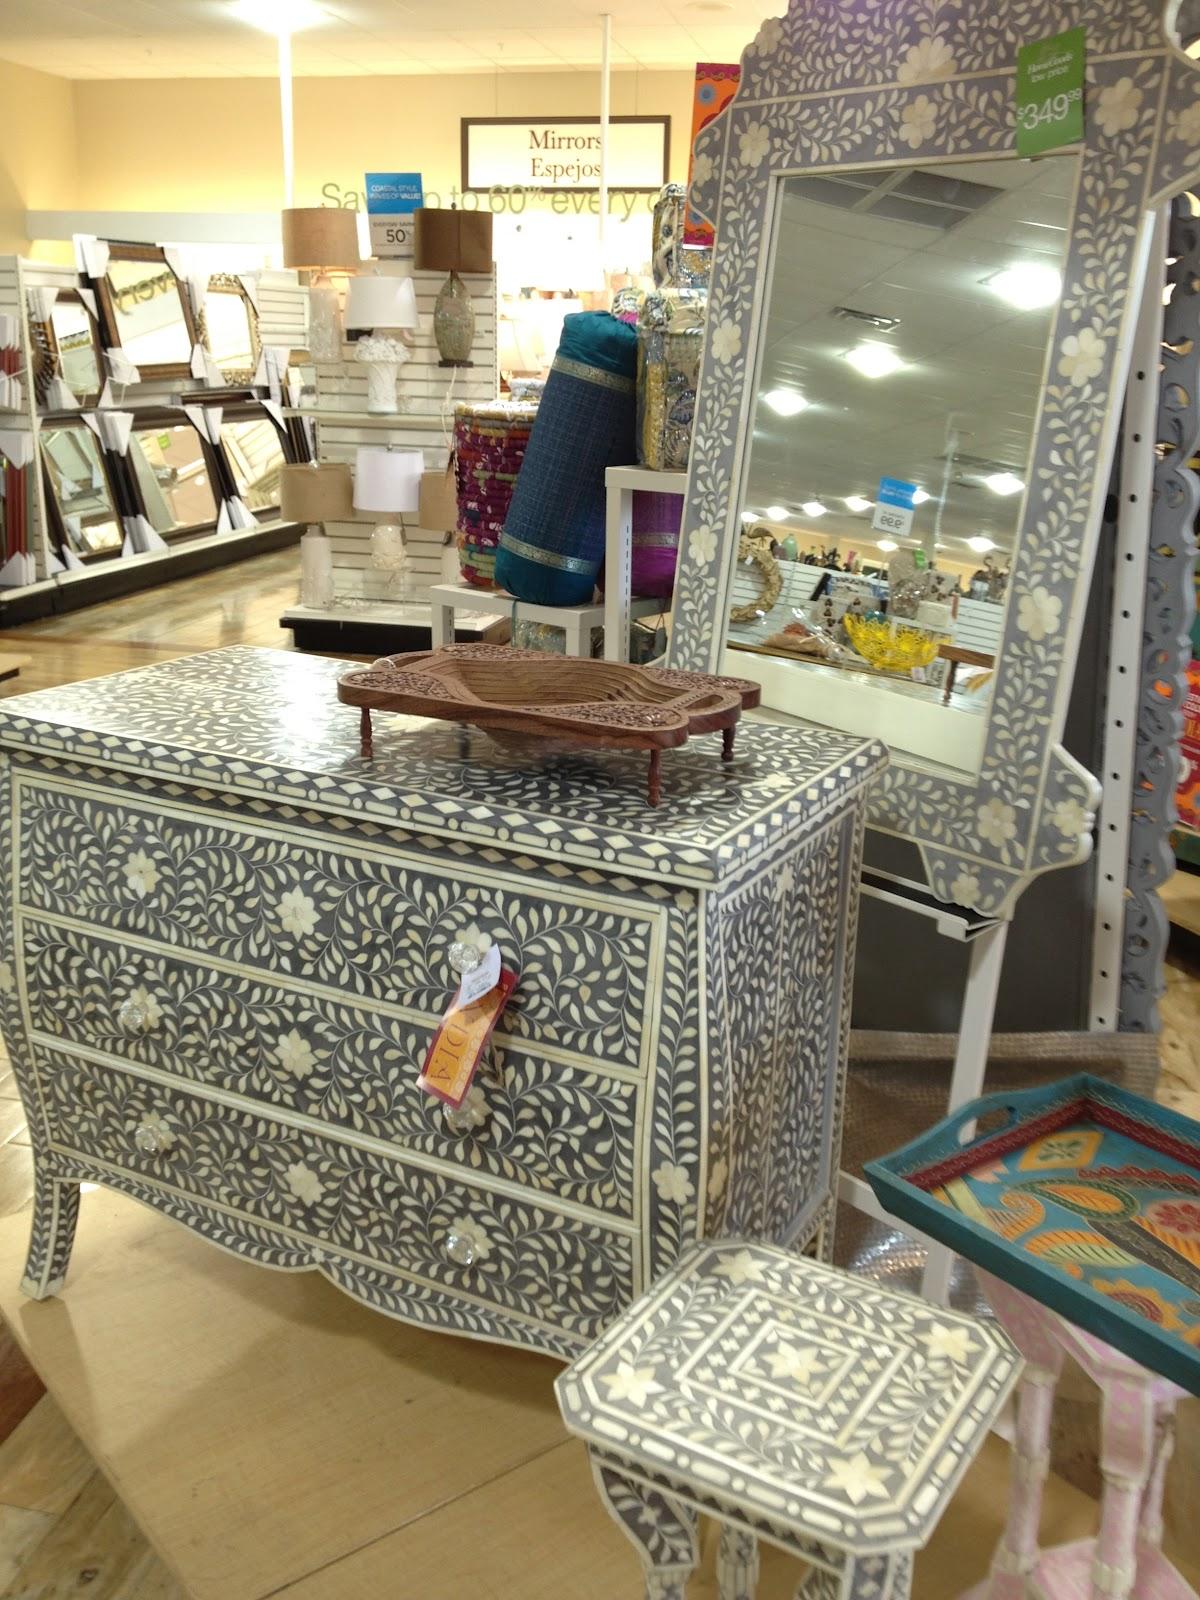 The Indian Bazaar is at TJMaxx Homegoods!